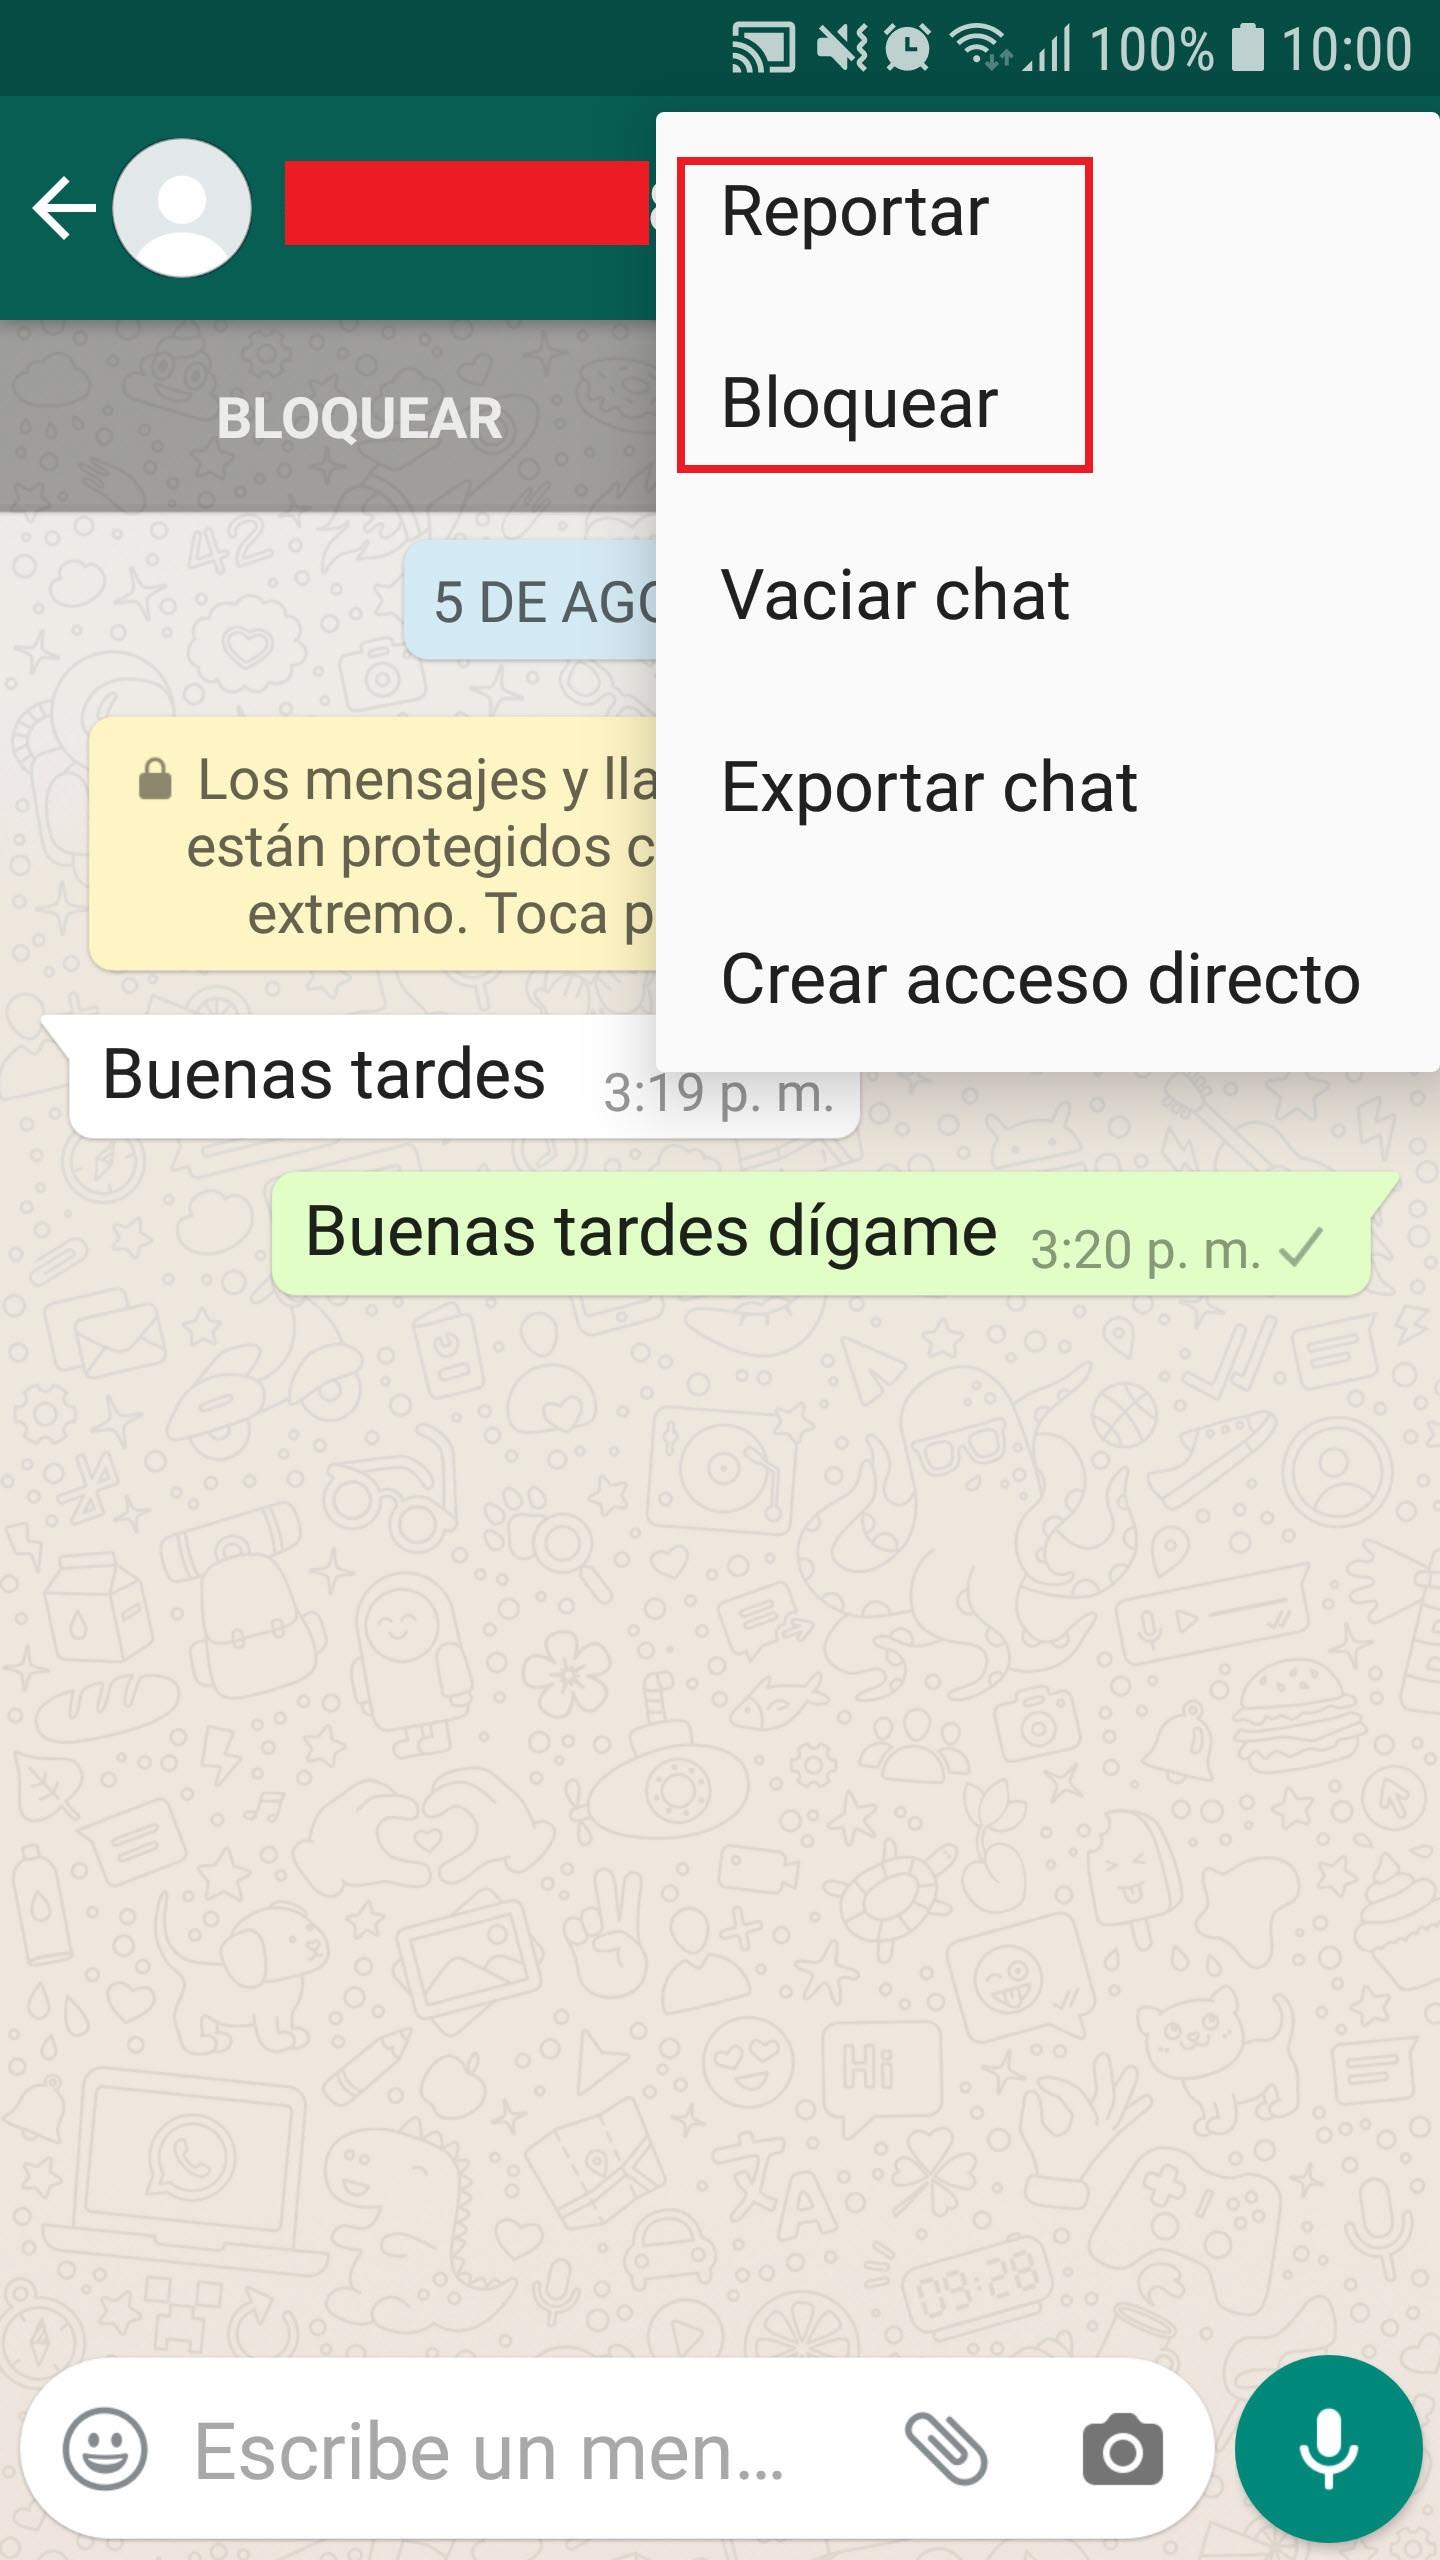 Cómo saber si te bloquearon en WhatsApp